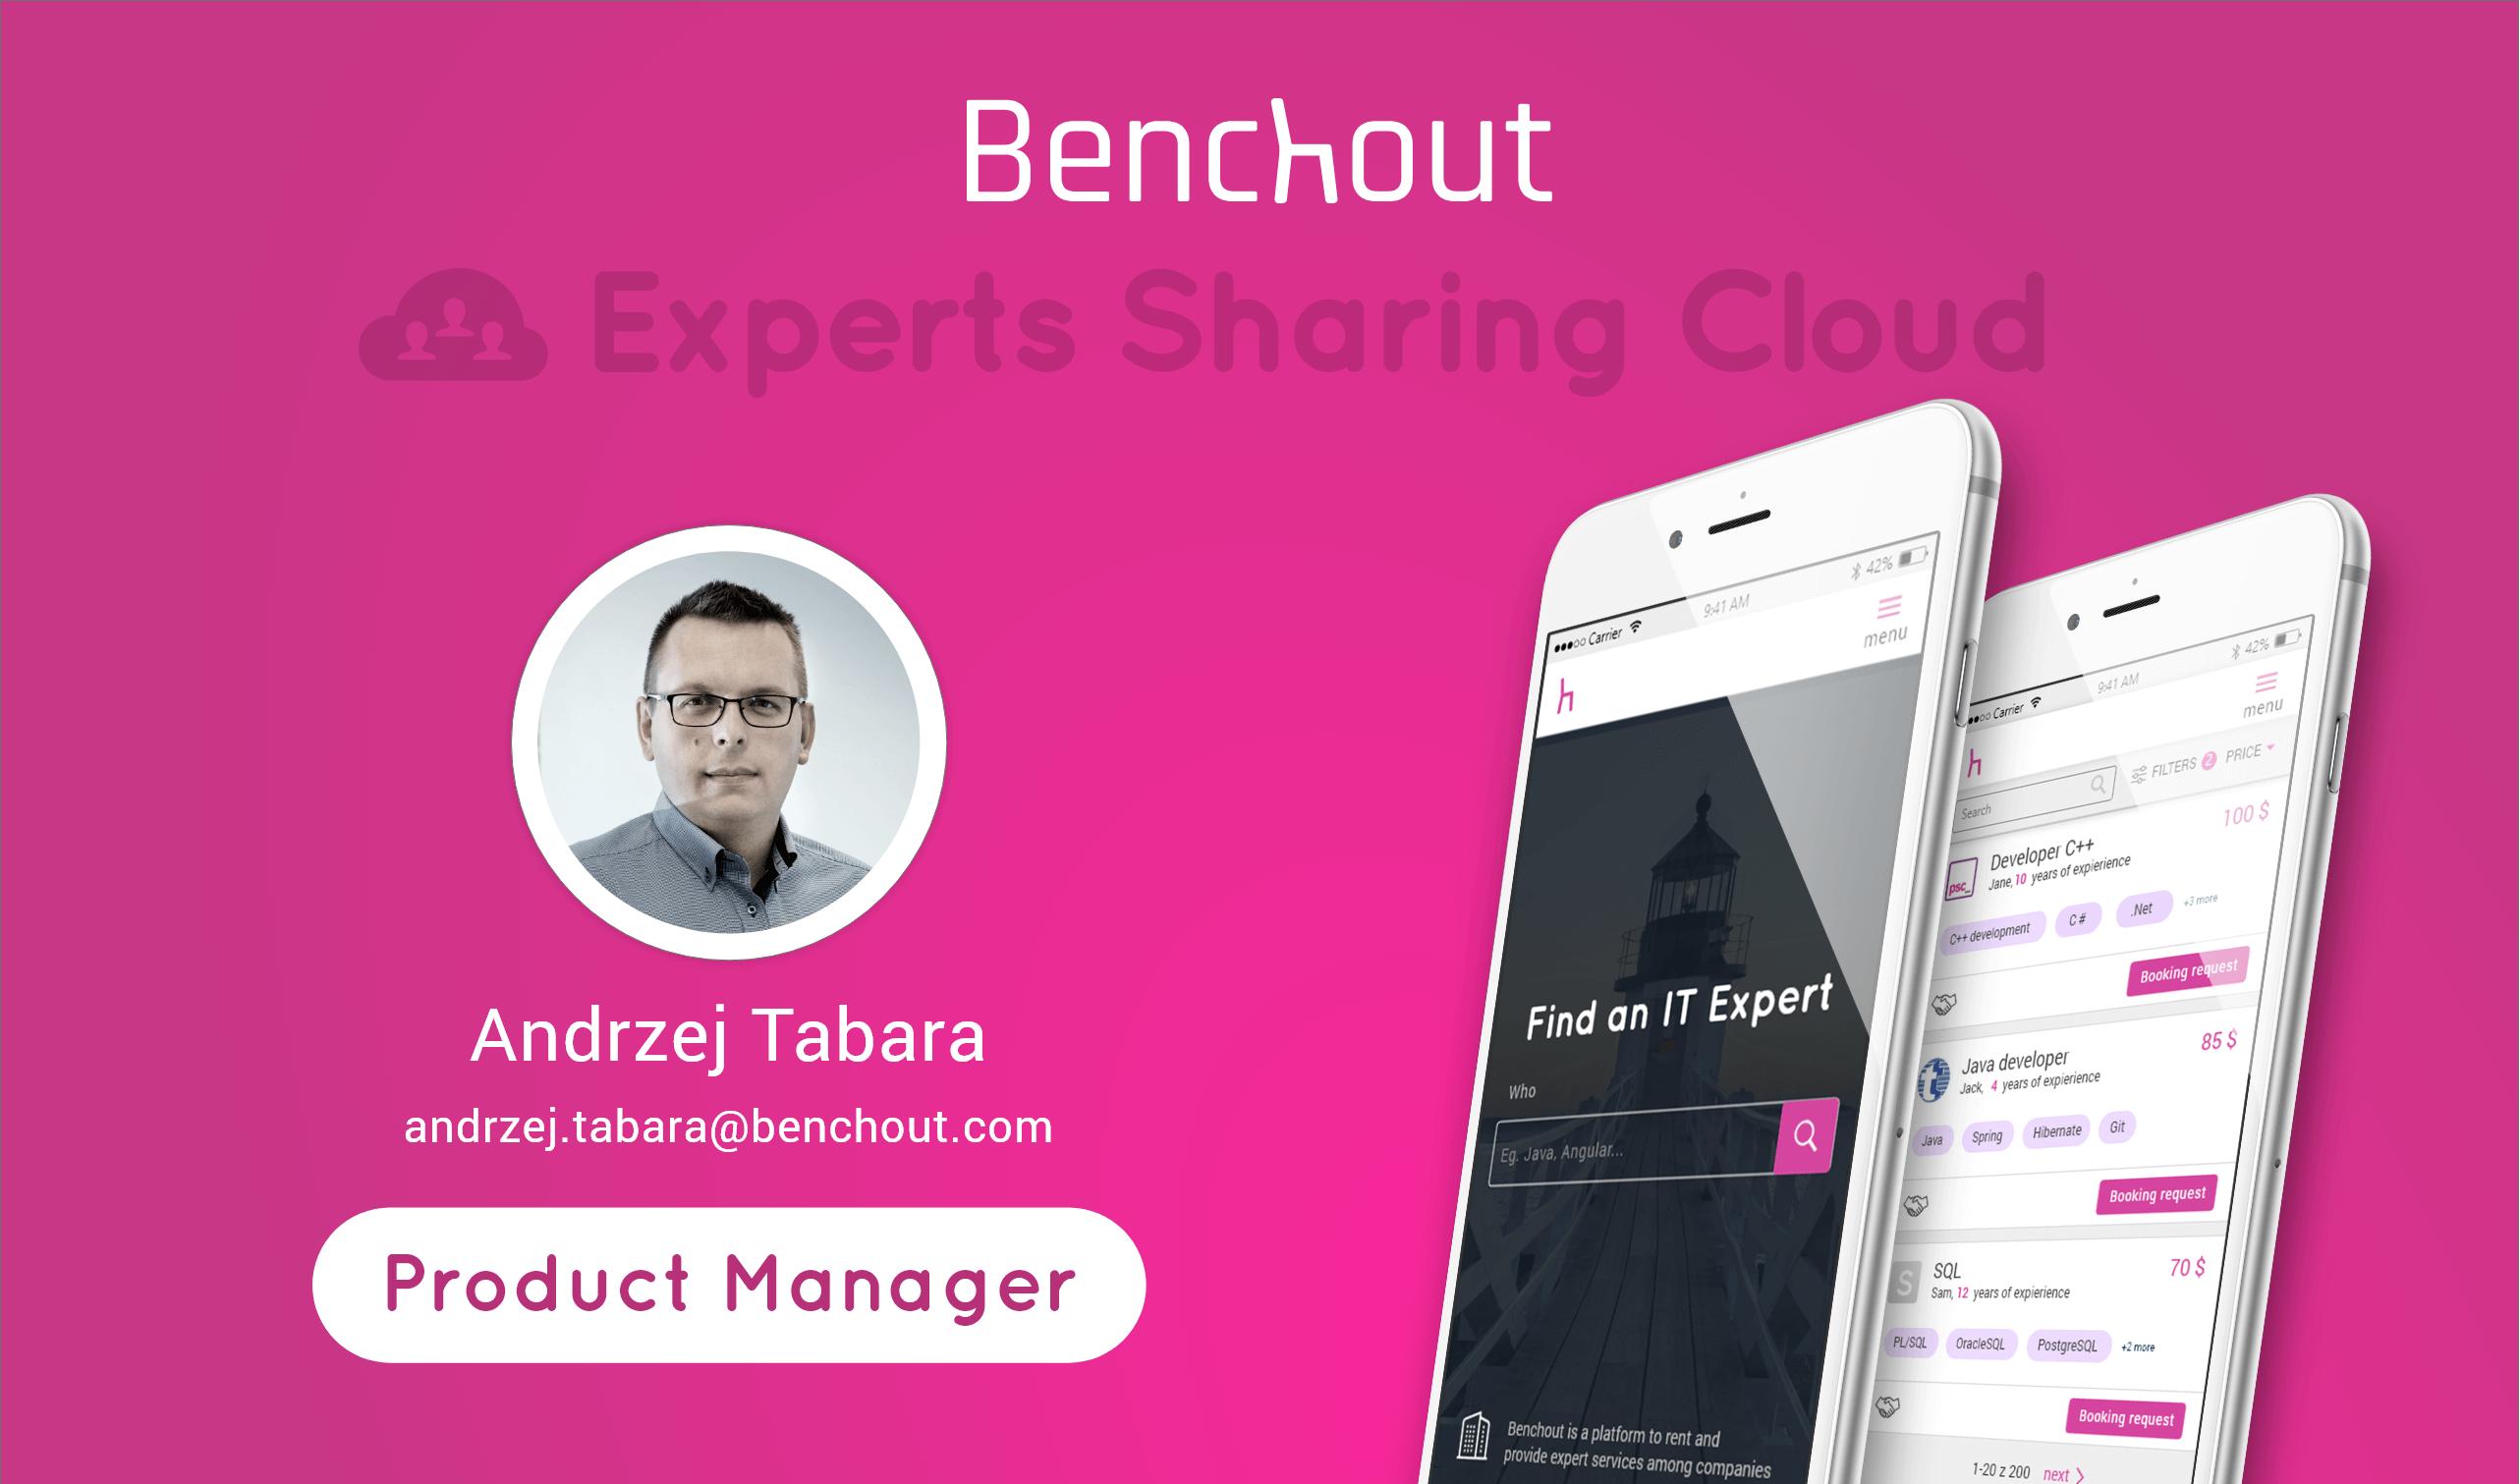 Benchout.com